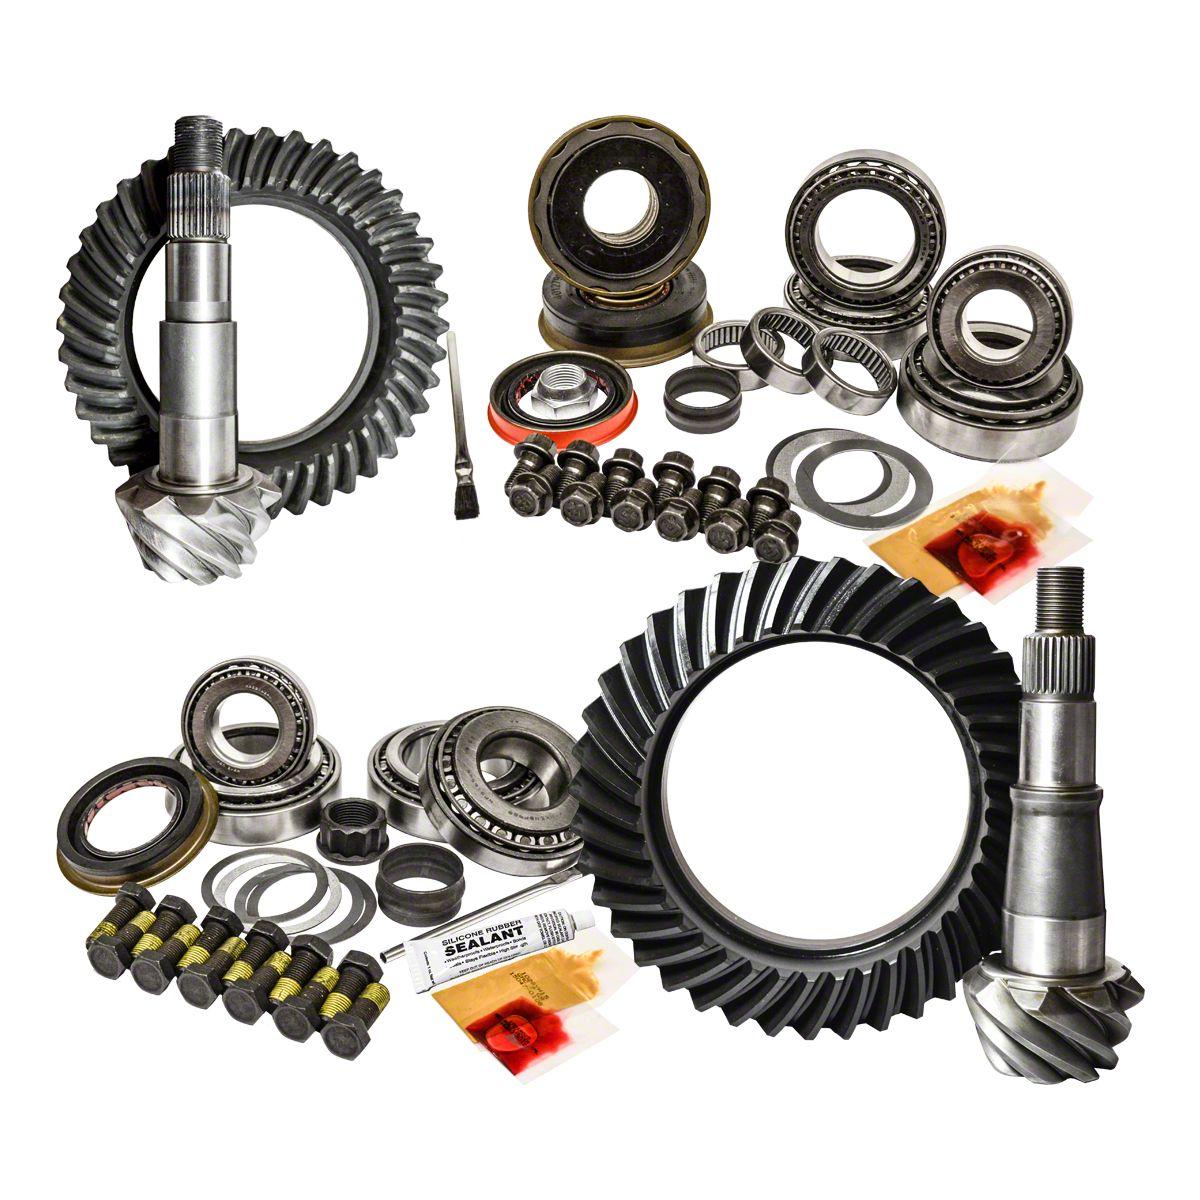 Jeep Wrangler YJ XJ Dana 30 Reverse 5.13 Ring and Pinion Master USA Gear Pkg